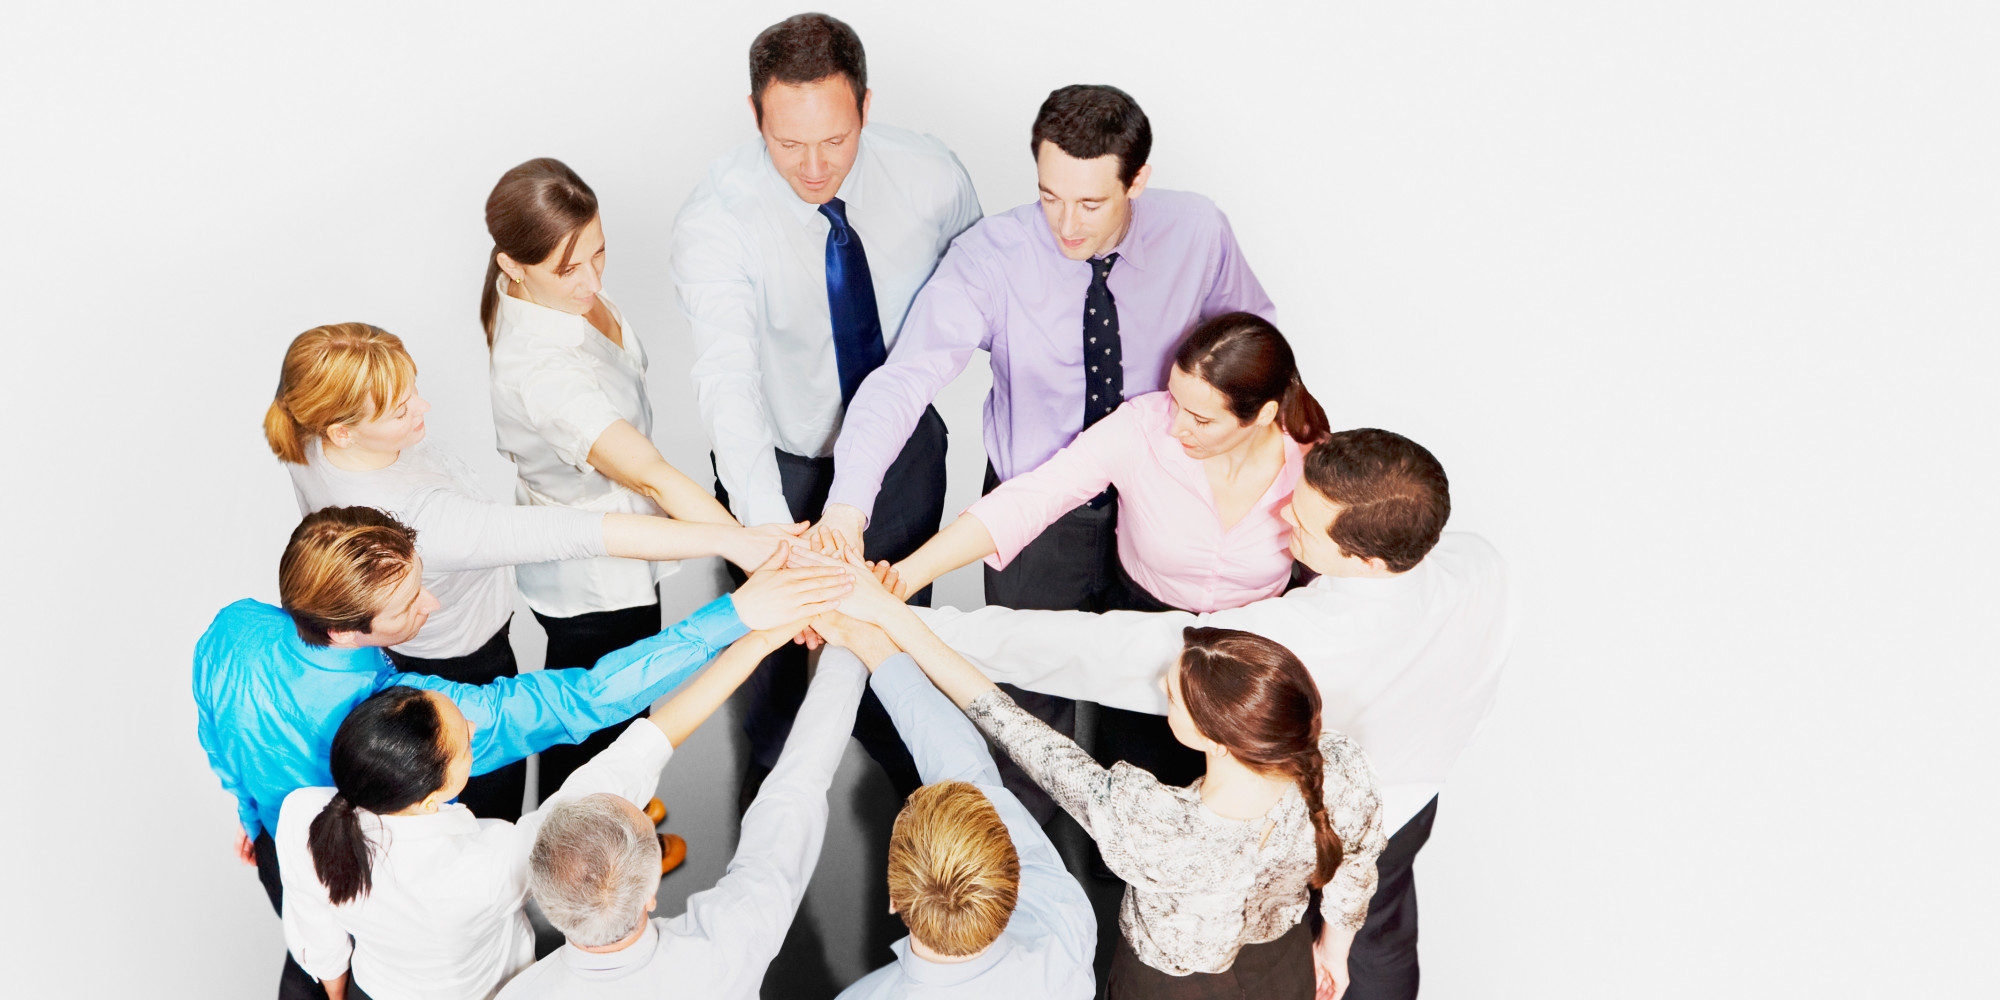 Team Building Event Ideas